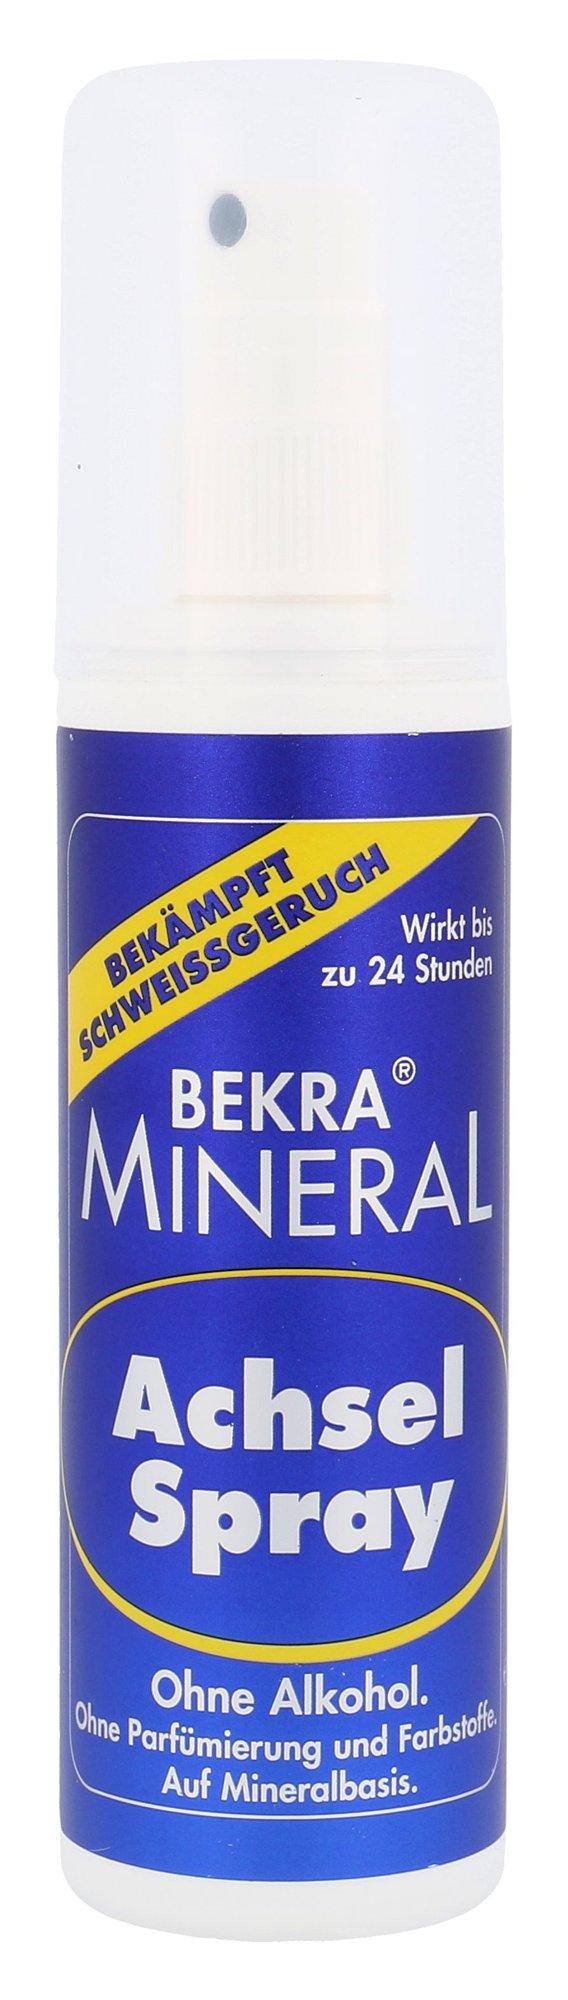 Bekra Mineral Underarm Spray Cosmetic 100ml